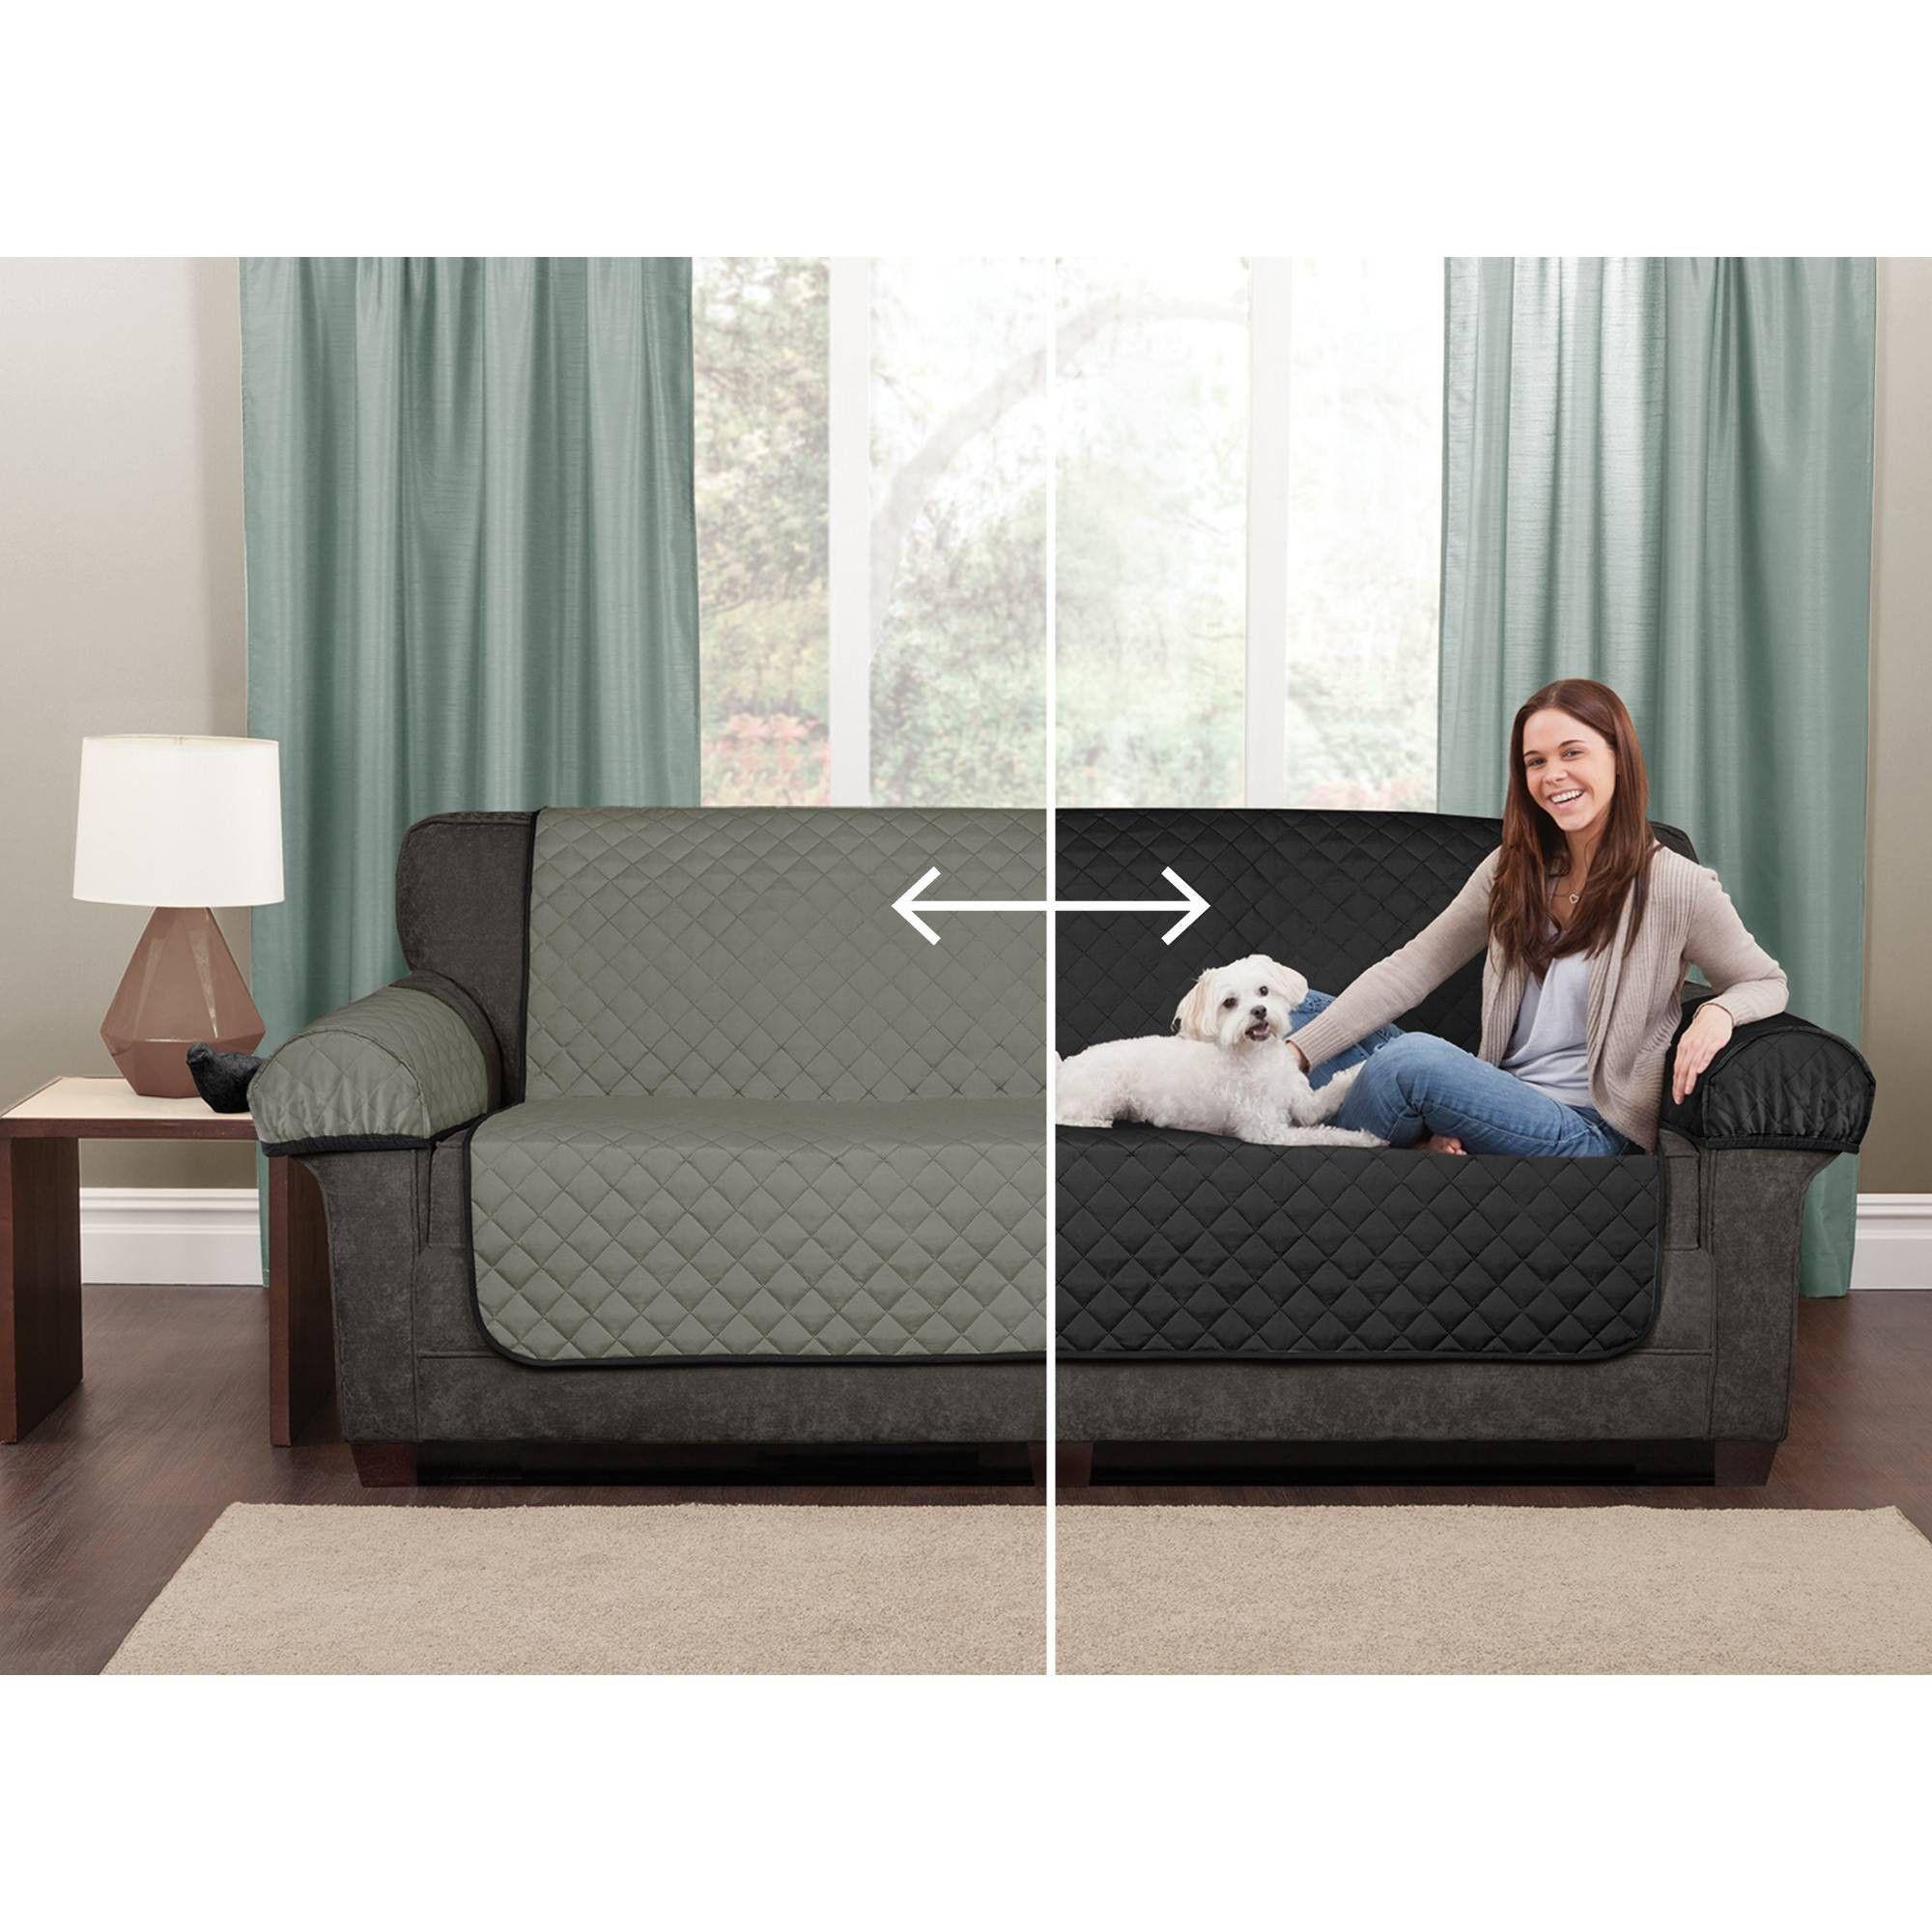 Black Reversible Pet Cover Microfiber Love Seat Slipcover Maytex